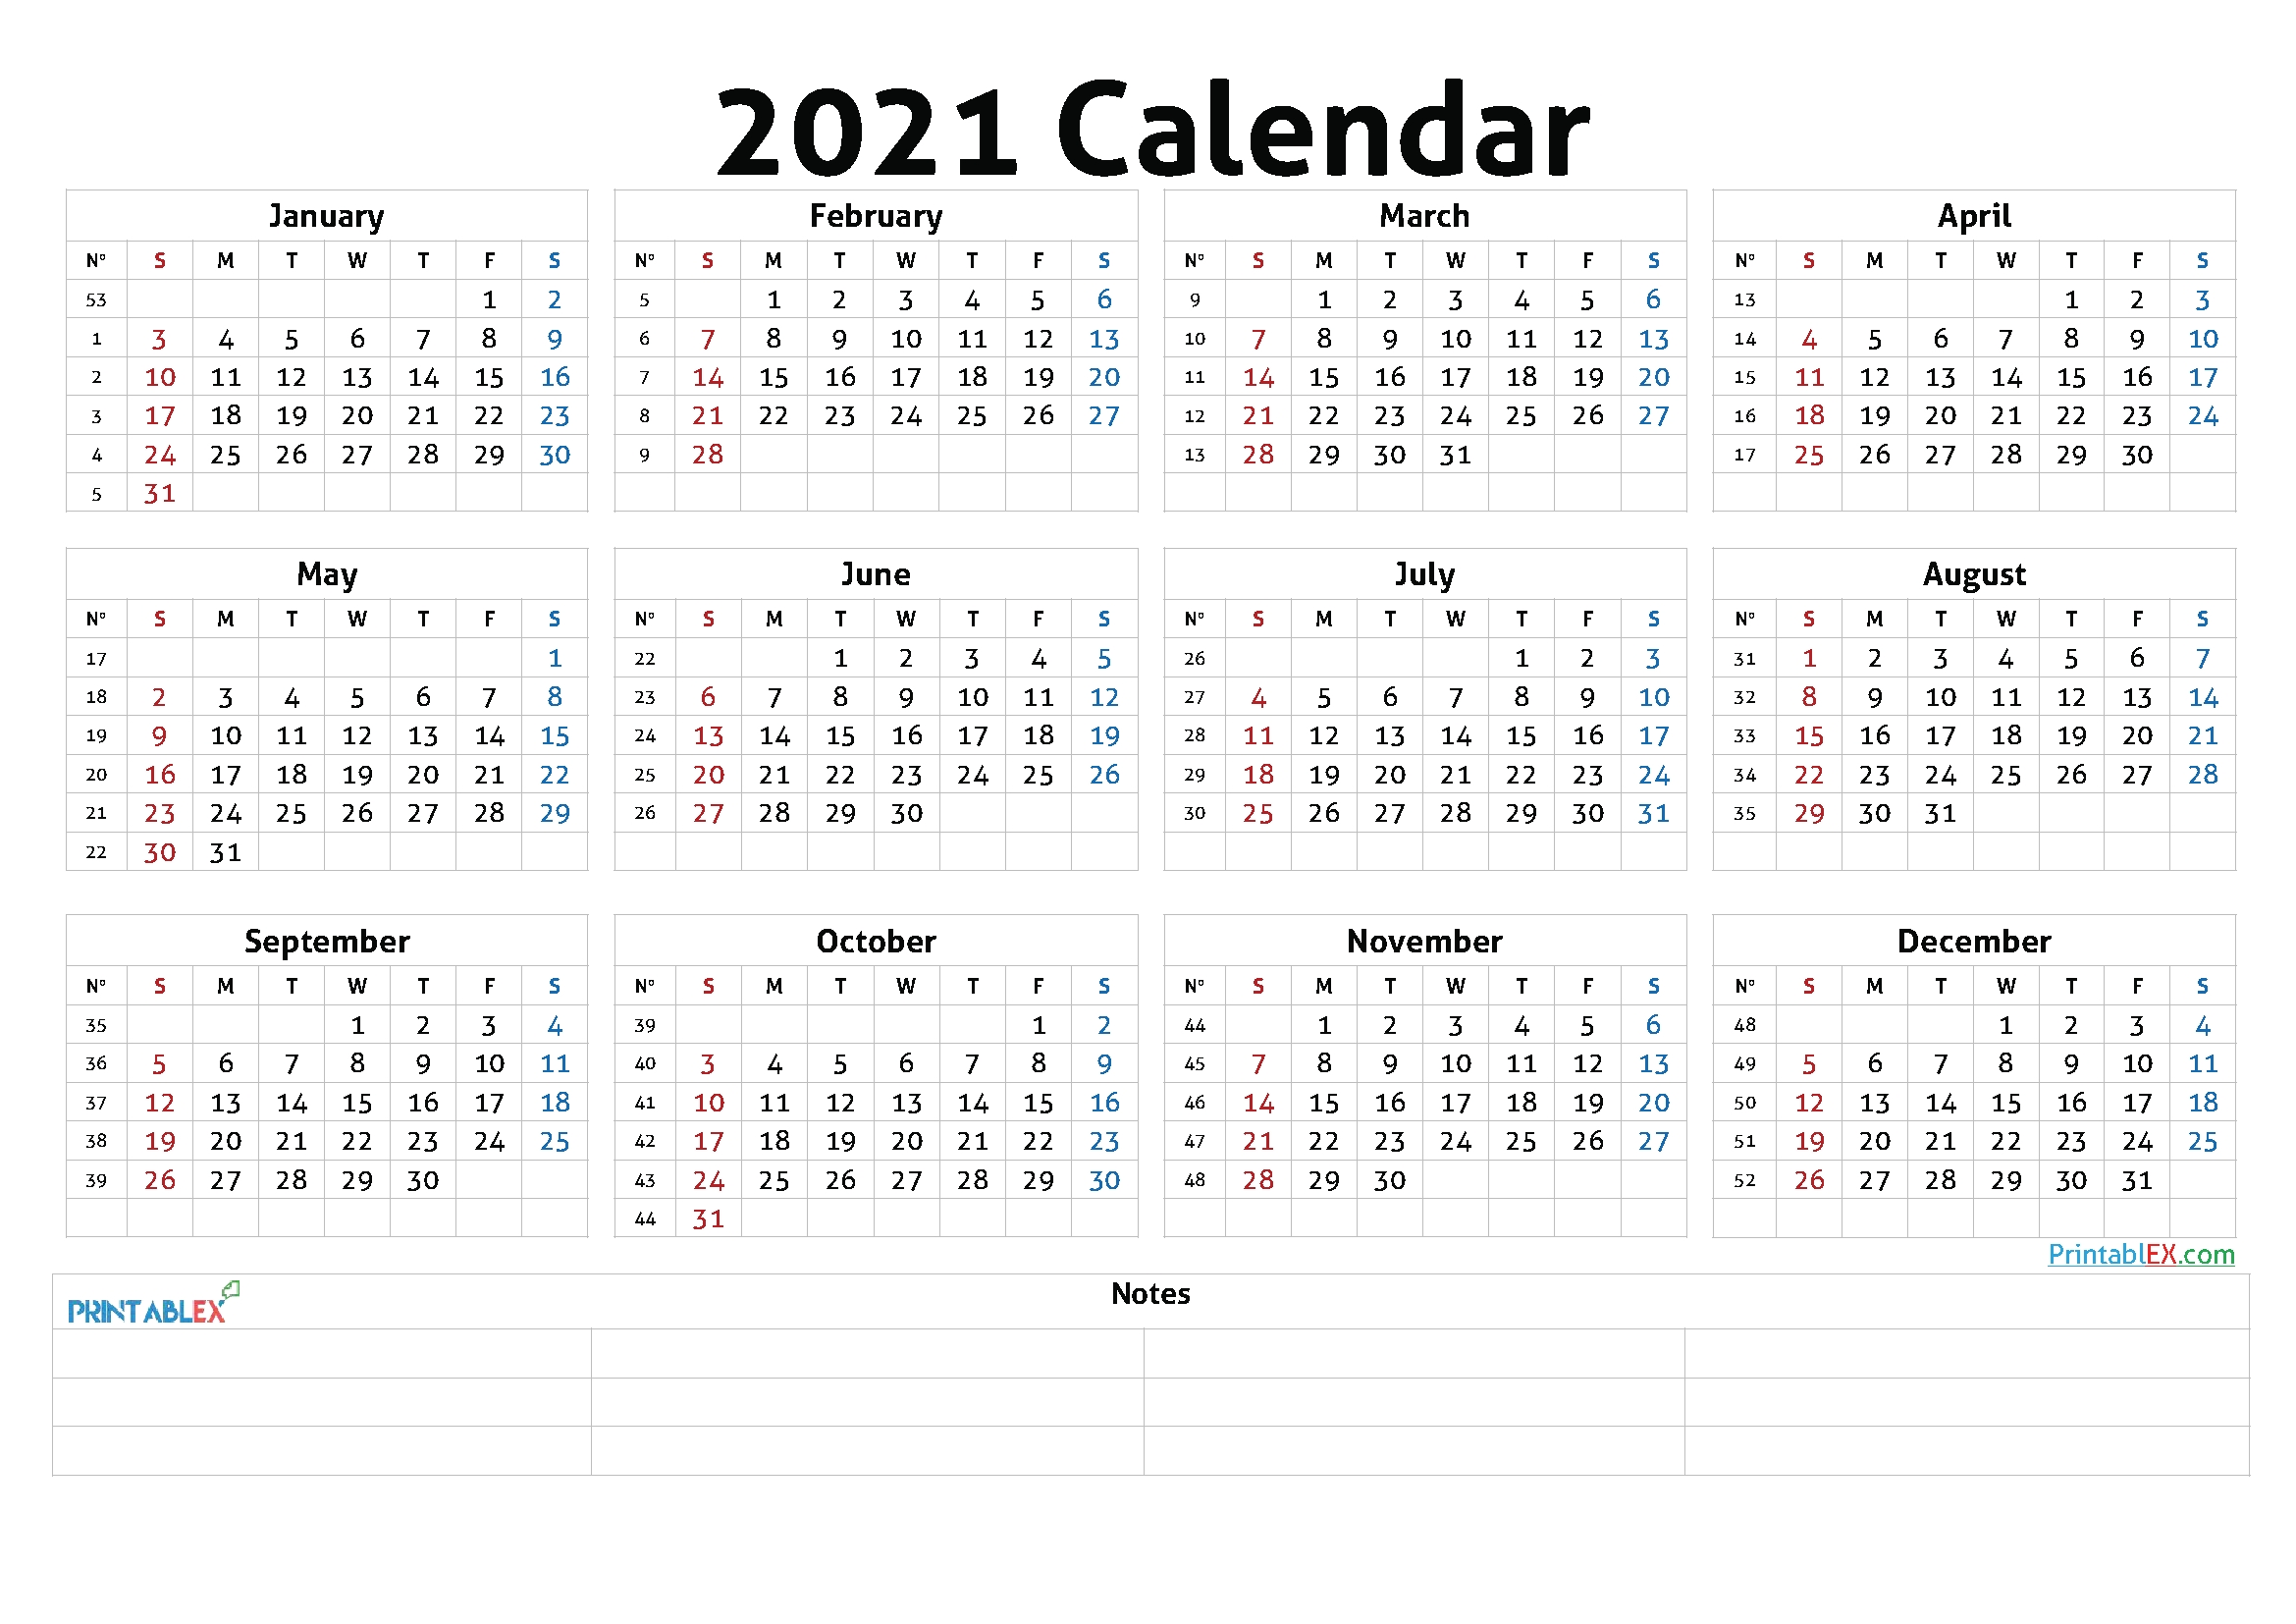 Printable 2021 Calendar By Year - 21Ytw46